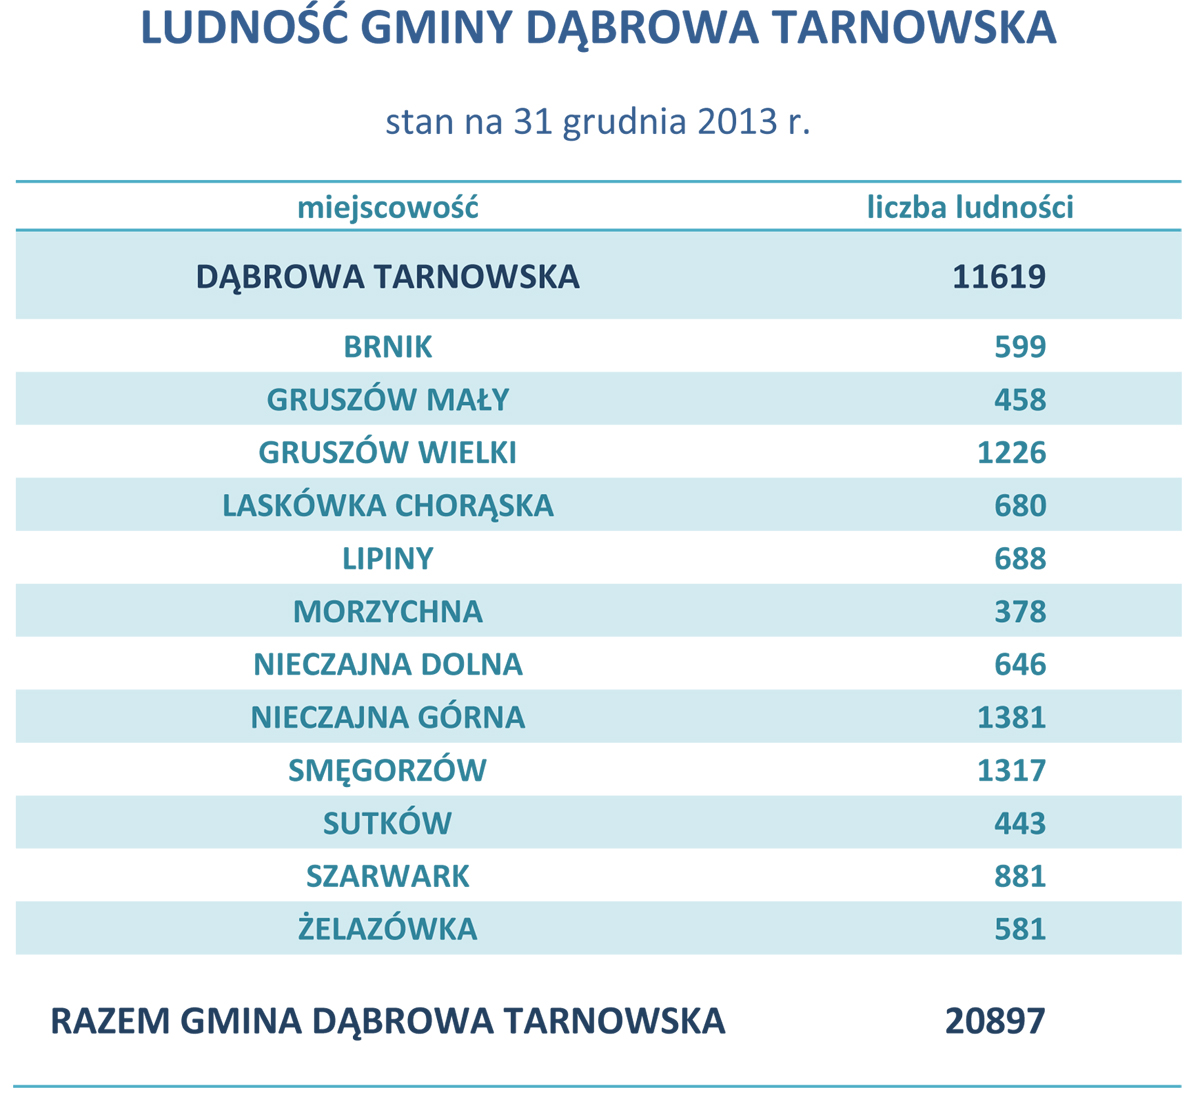 LUDNOŚĆ GMINY DĄBROWA TARNOWSKA 31-12-2013